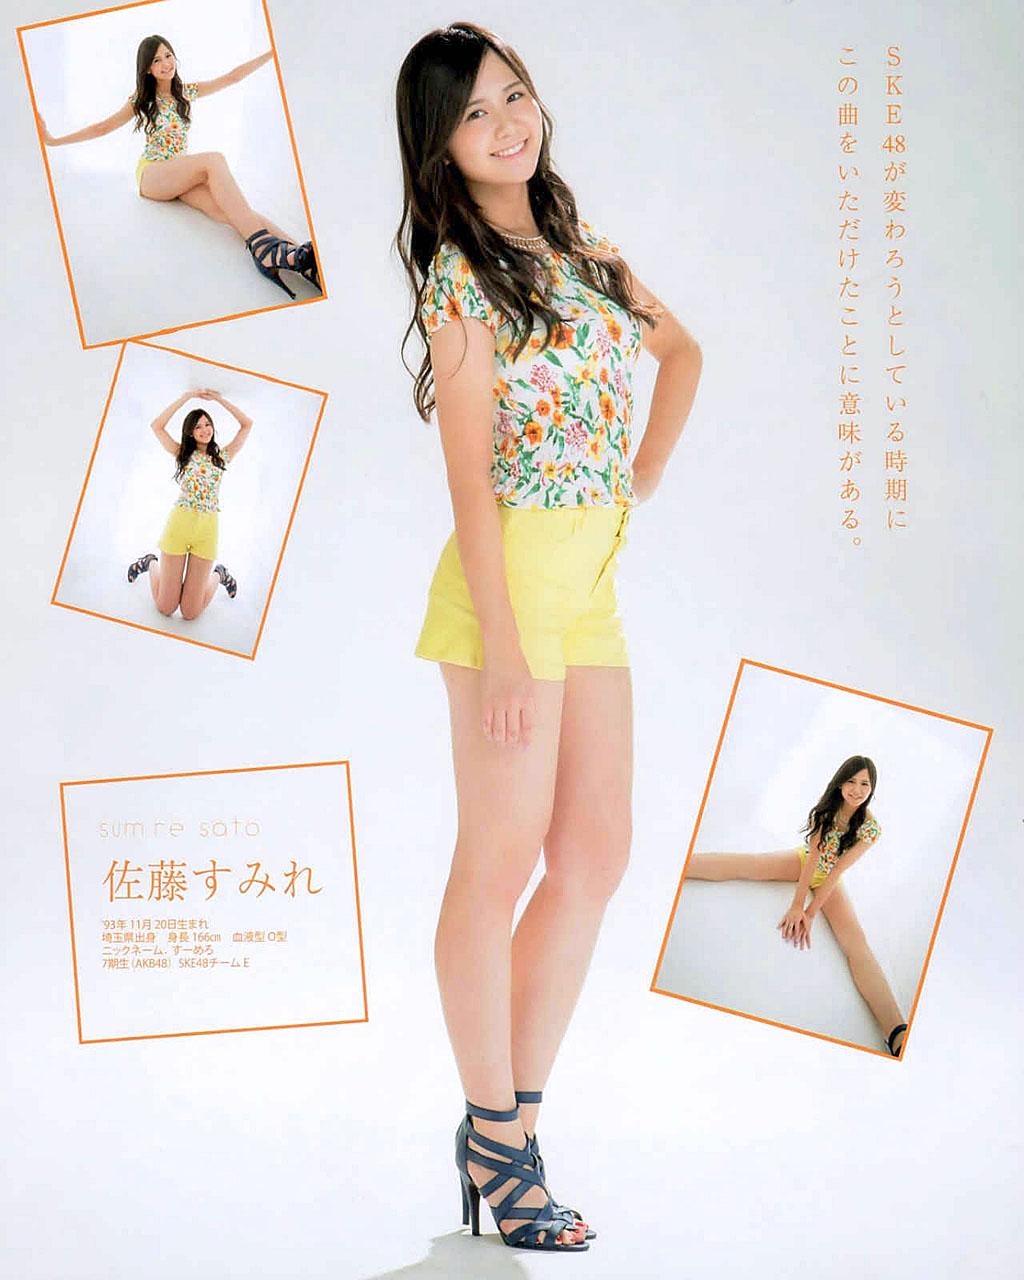 Sato Sumire 03.jpg